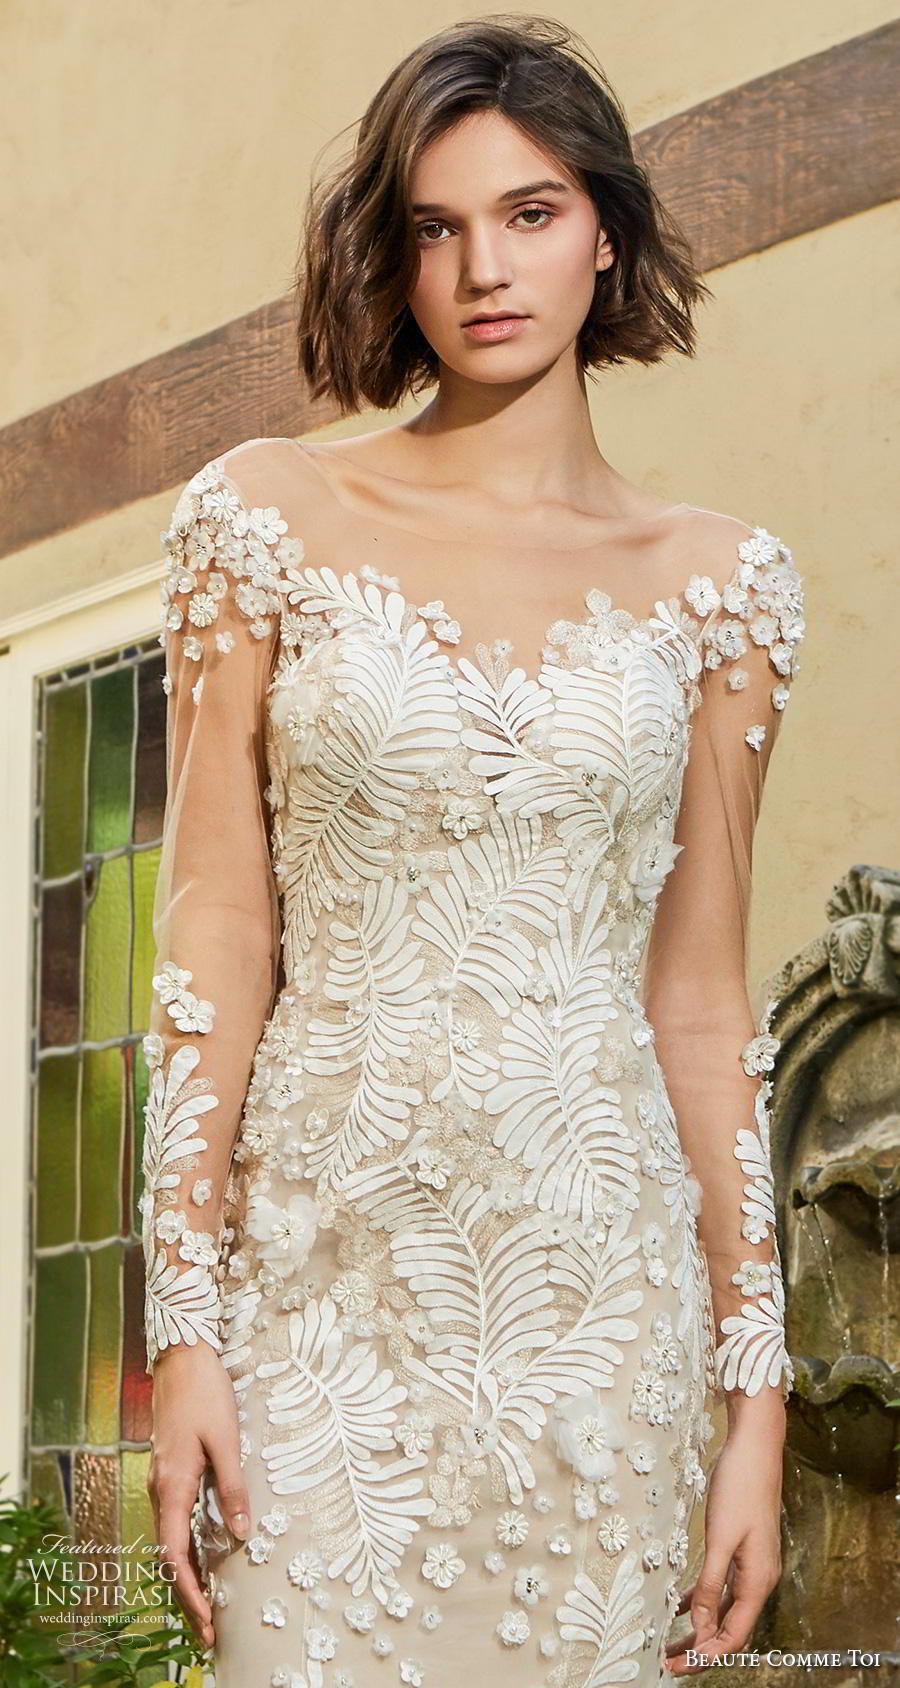 beaute comme toi f2020 bridal long sleeves illusion bateau neckline full embellishment elegant sheath wedding dress backless low back short train (daphne) zv